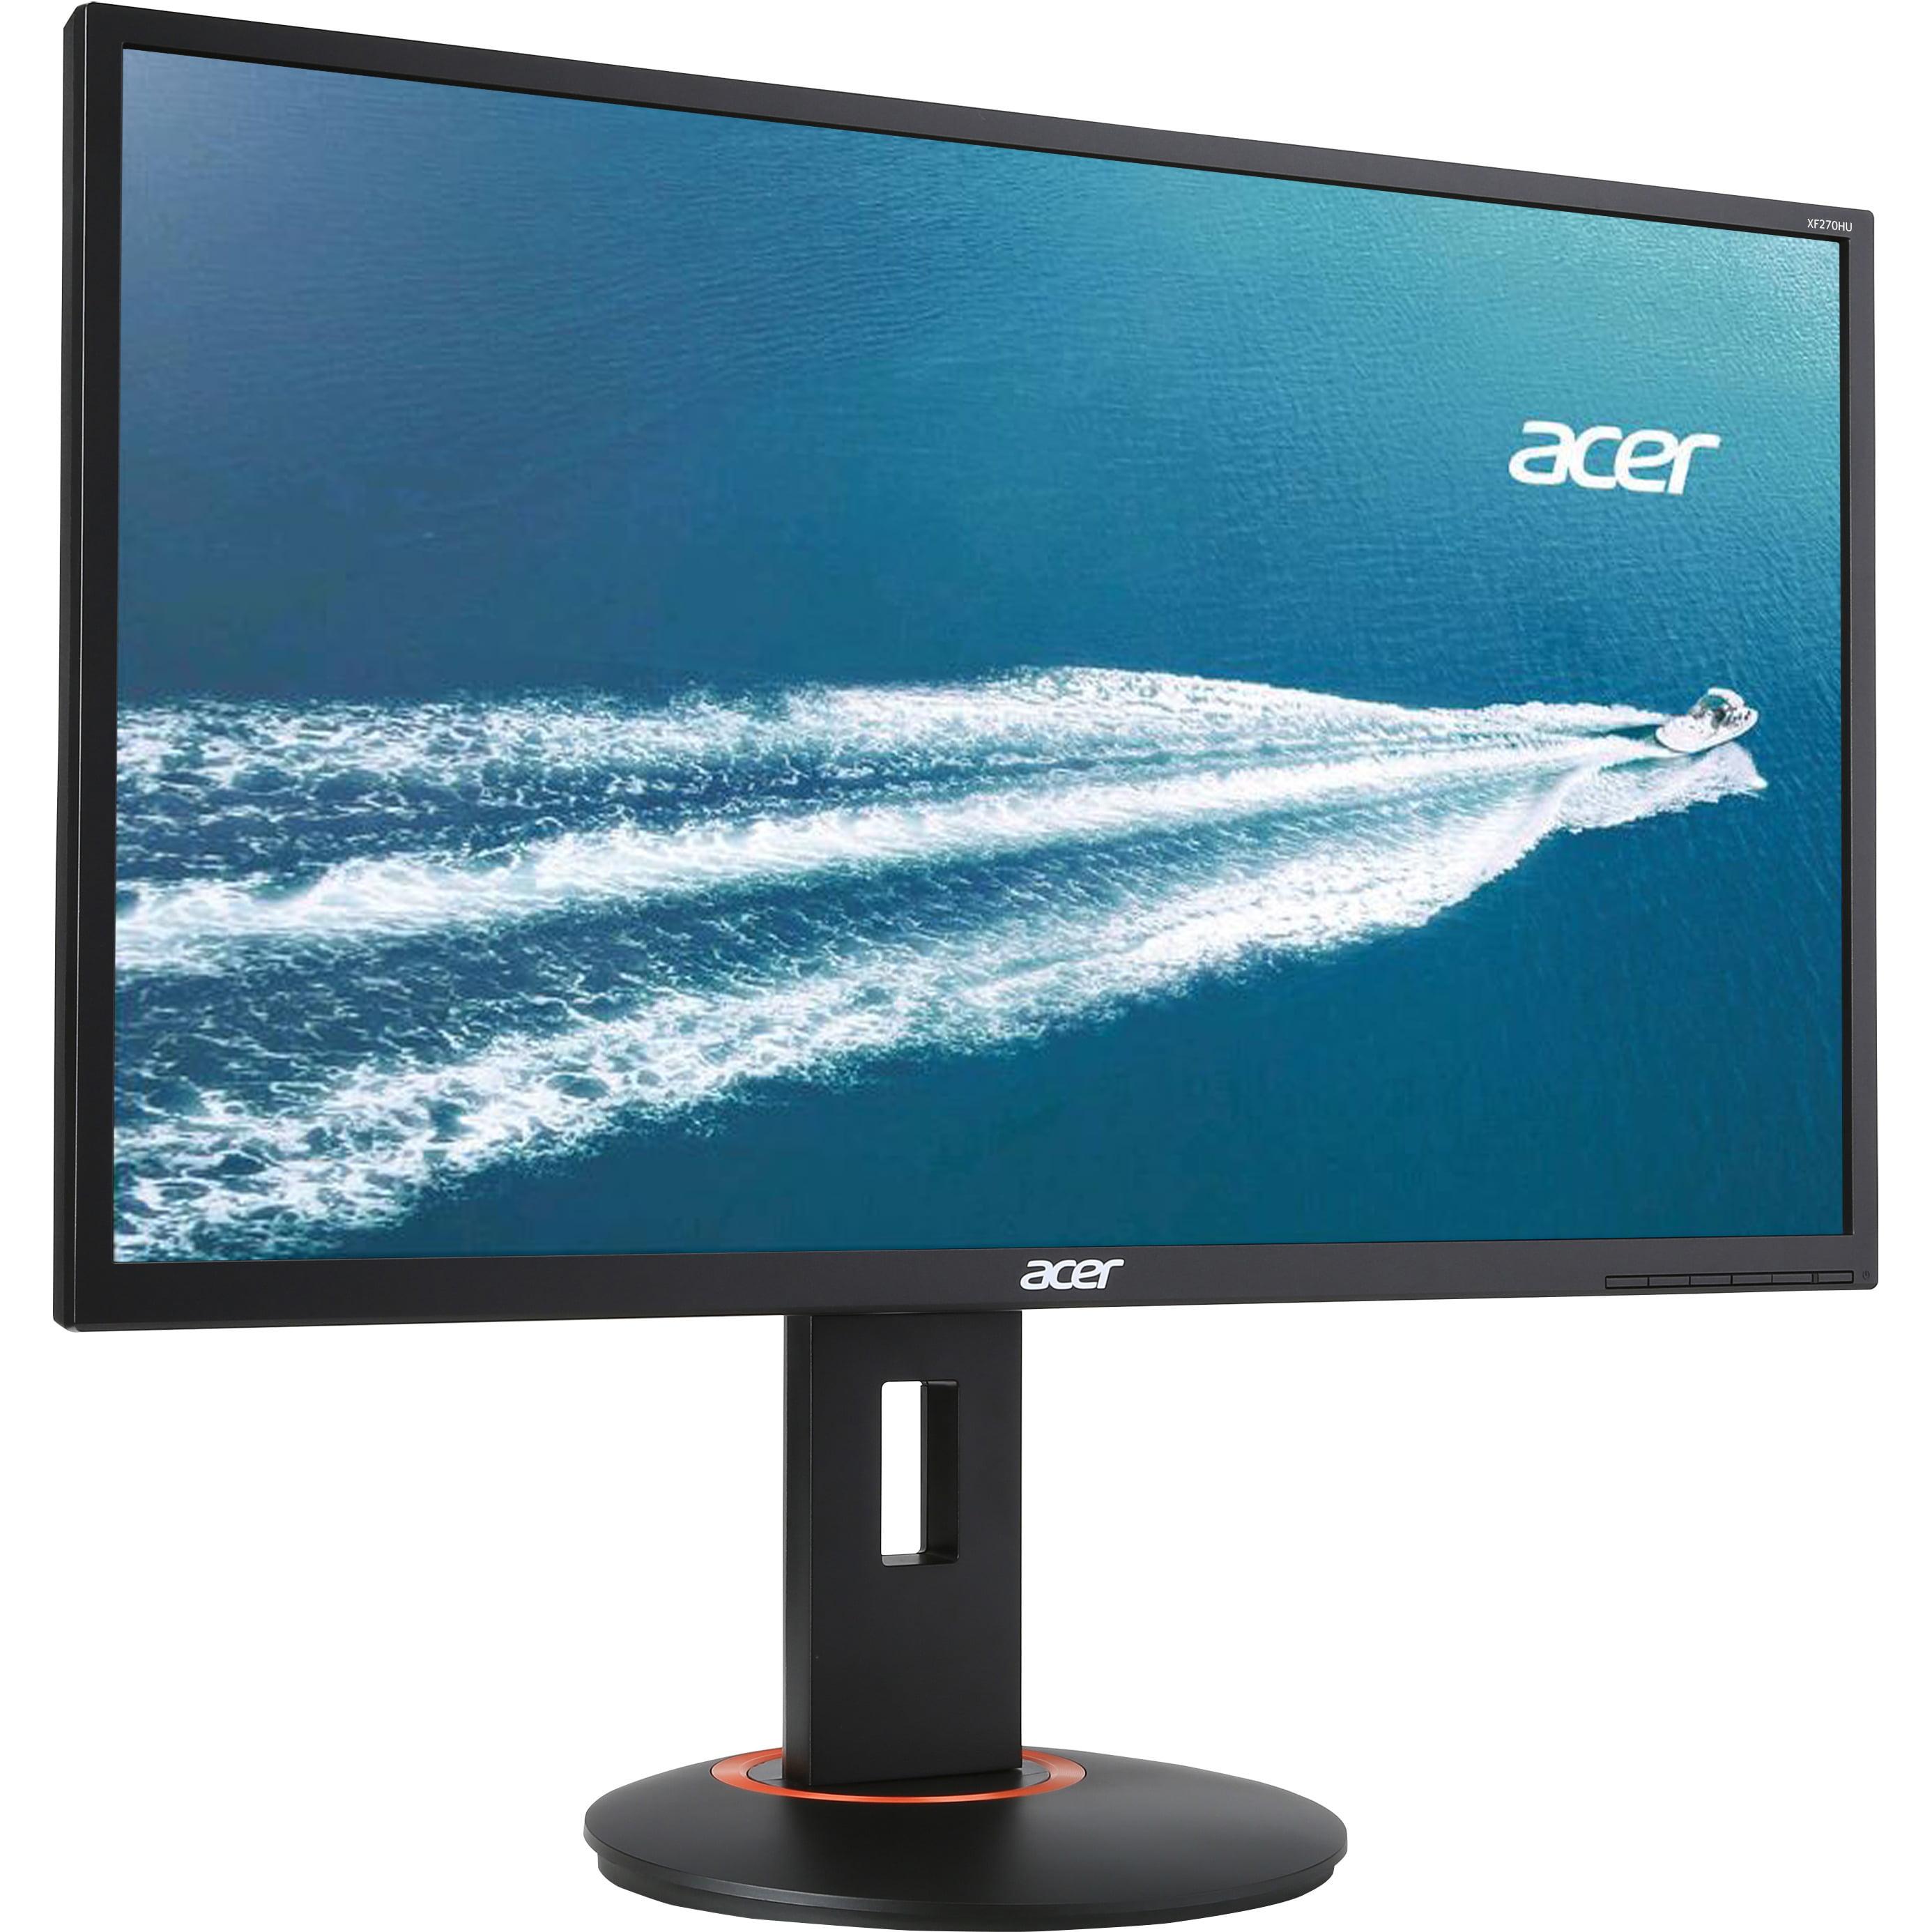 "Acer 27"" Widescreen LCD Monitor Display WQHD 2560 x 1440 4 ms XF270HU ABMIIDPRZX   Manufacturer Refurbished"